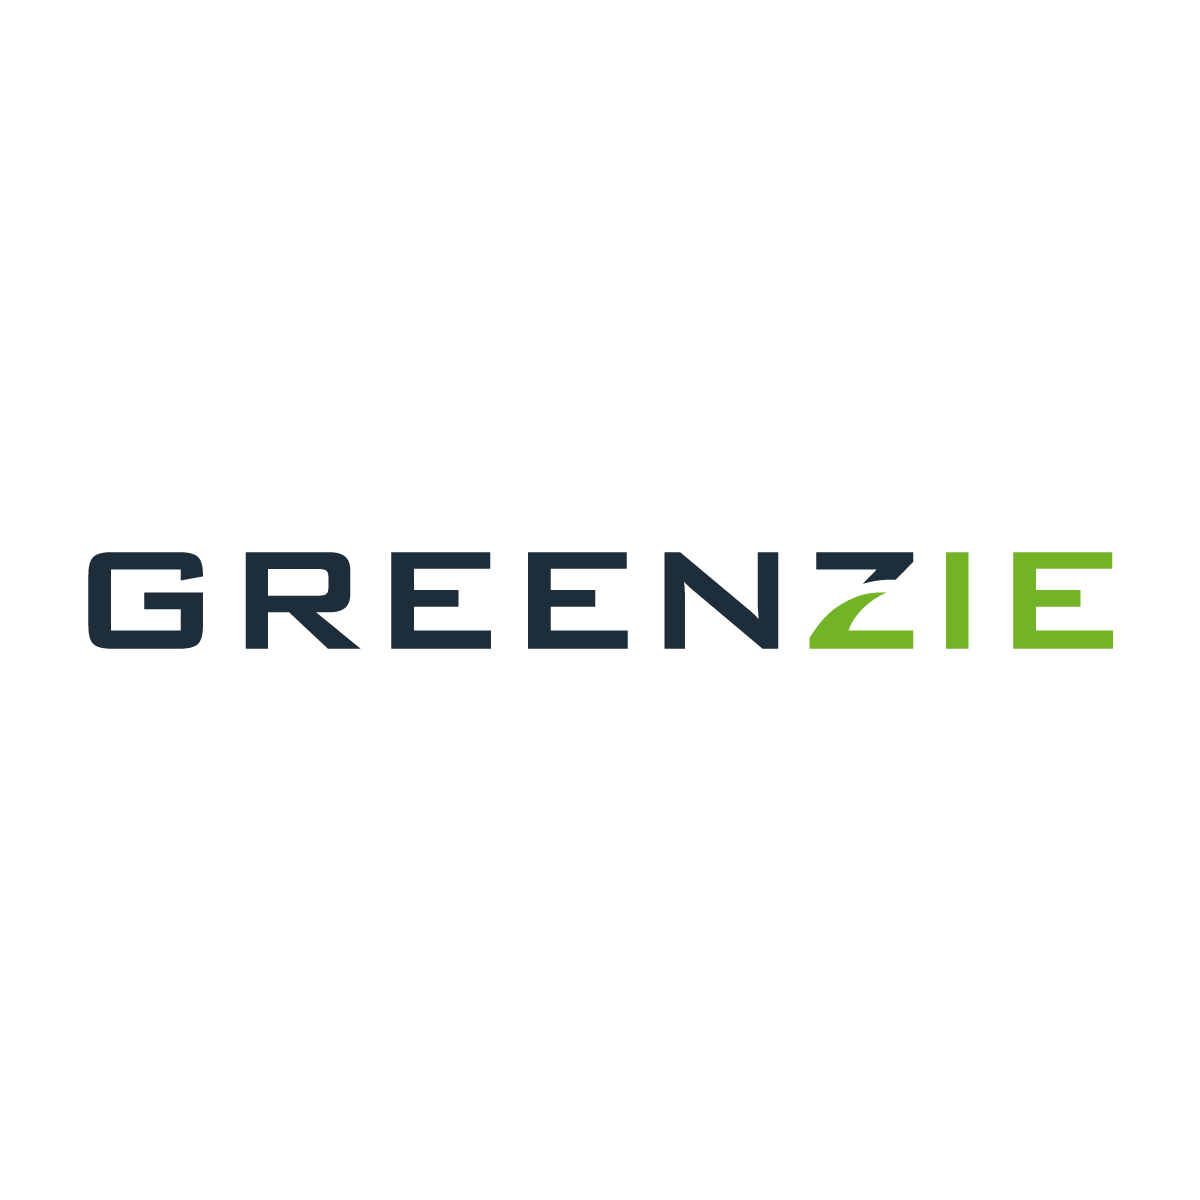 Greenzie_website.png